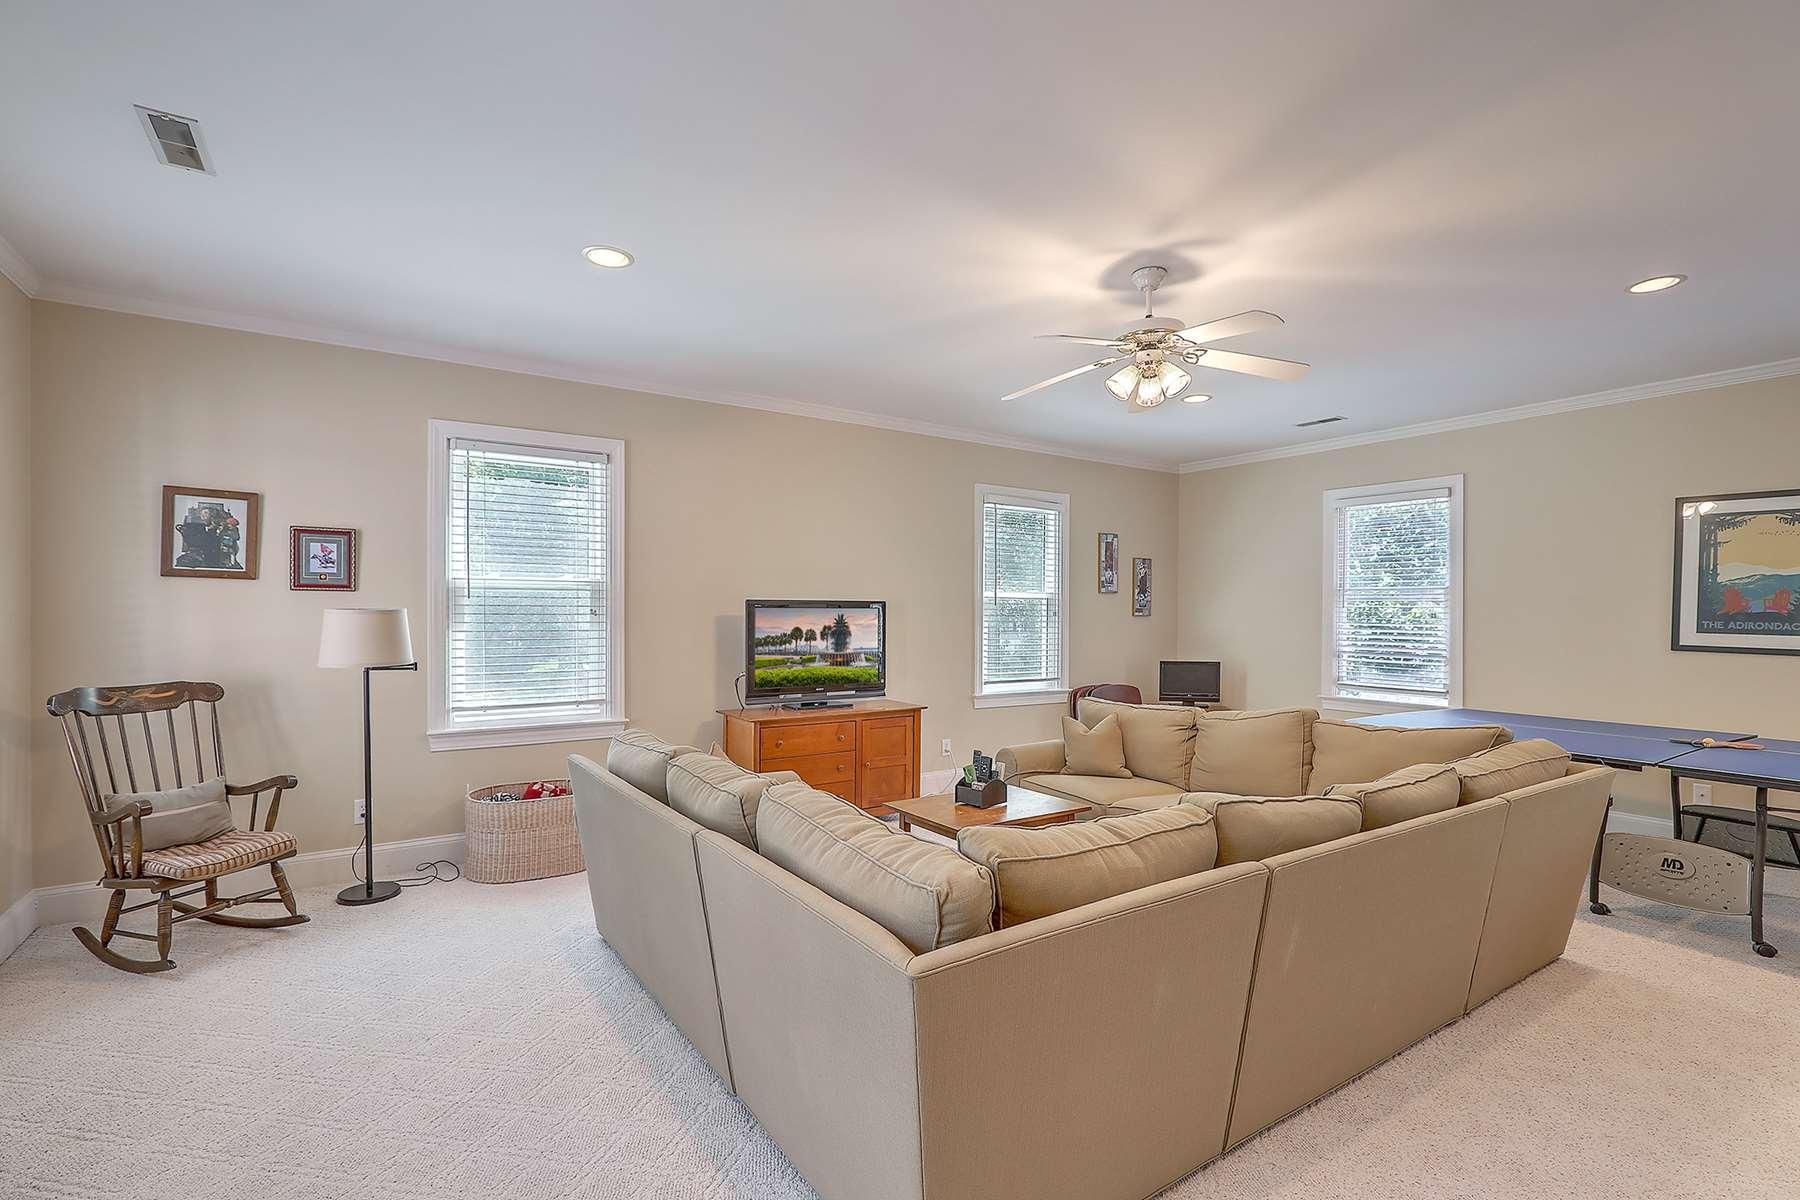 Dunes West Homes For Sale - 2961 Pignatelli, Mount Pleasant, SC - 19